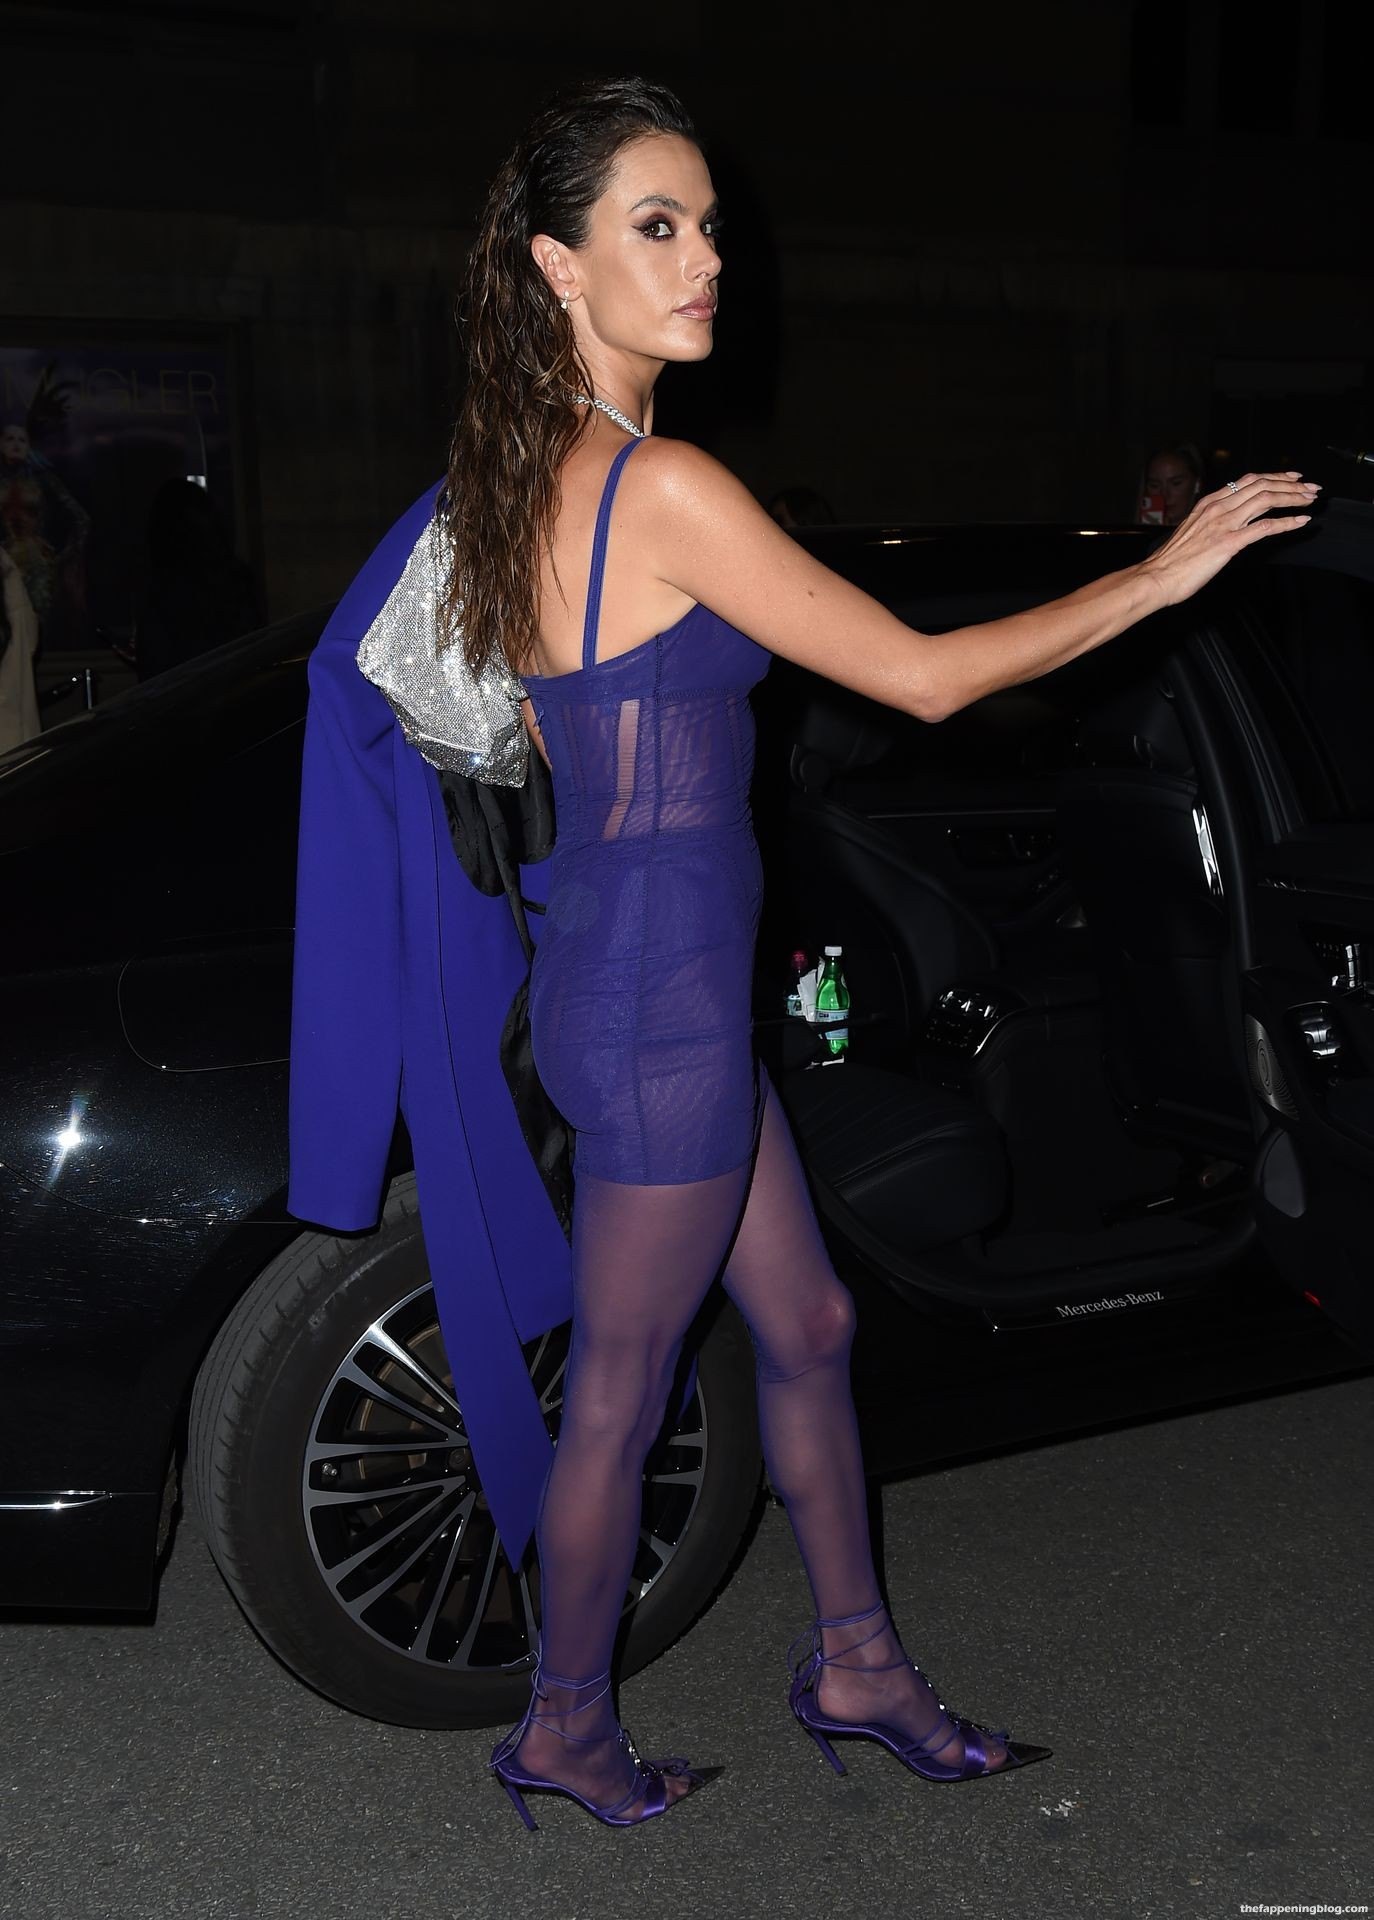 Alessandra-Ambrosio-Sexy-The-Fappening-Blog-22-3.jpg